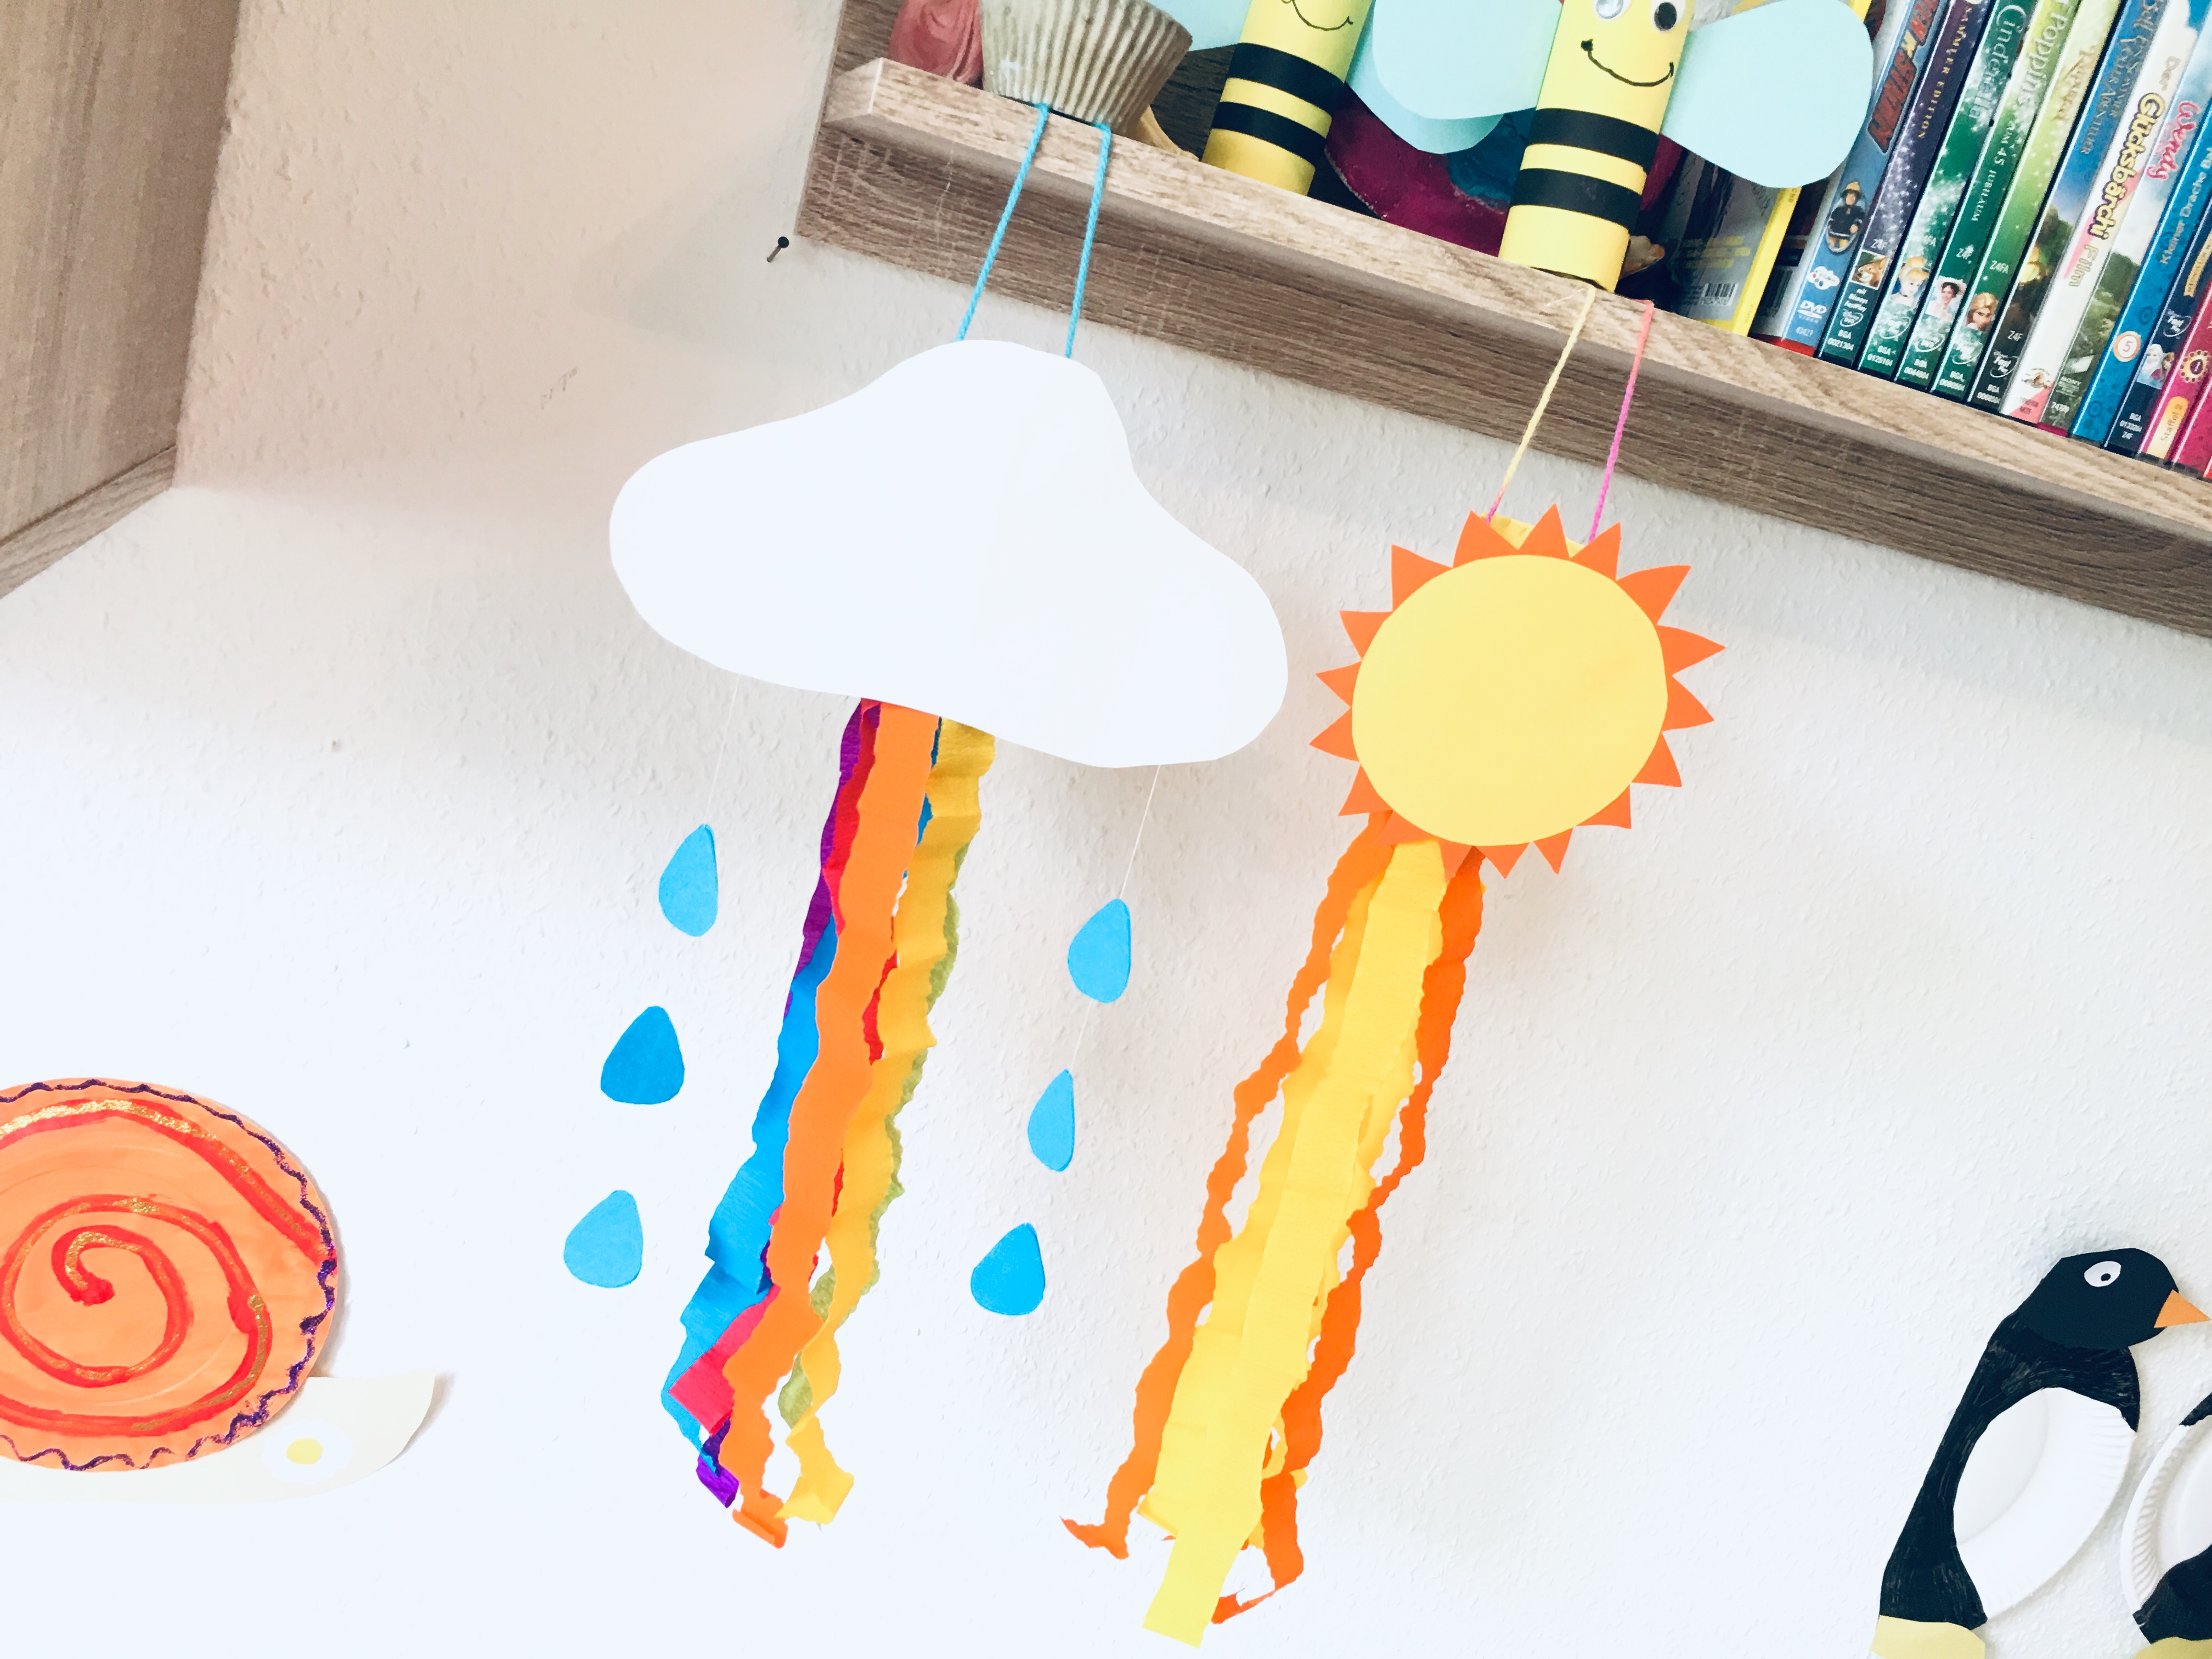 Bunte Windspiele Aus Toilettenpapierrollen Basteln Mit Kindern